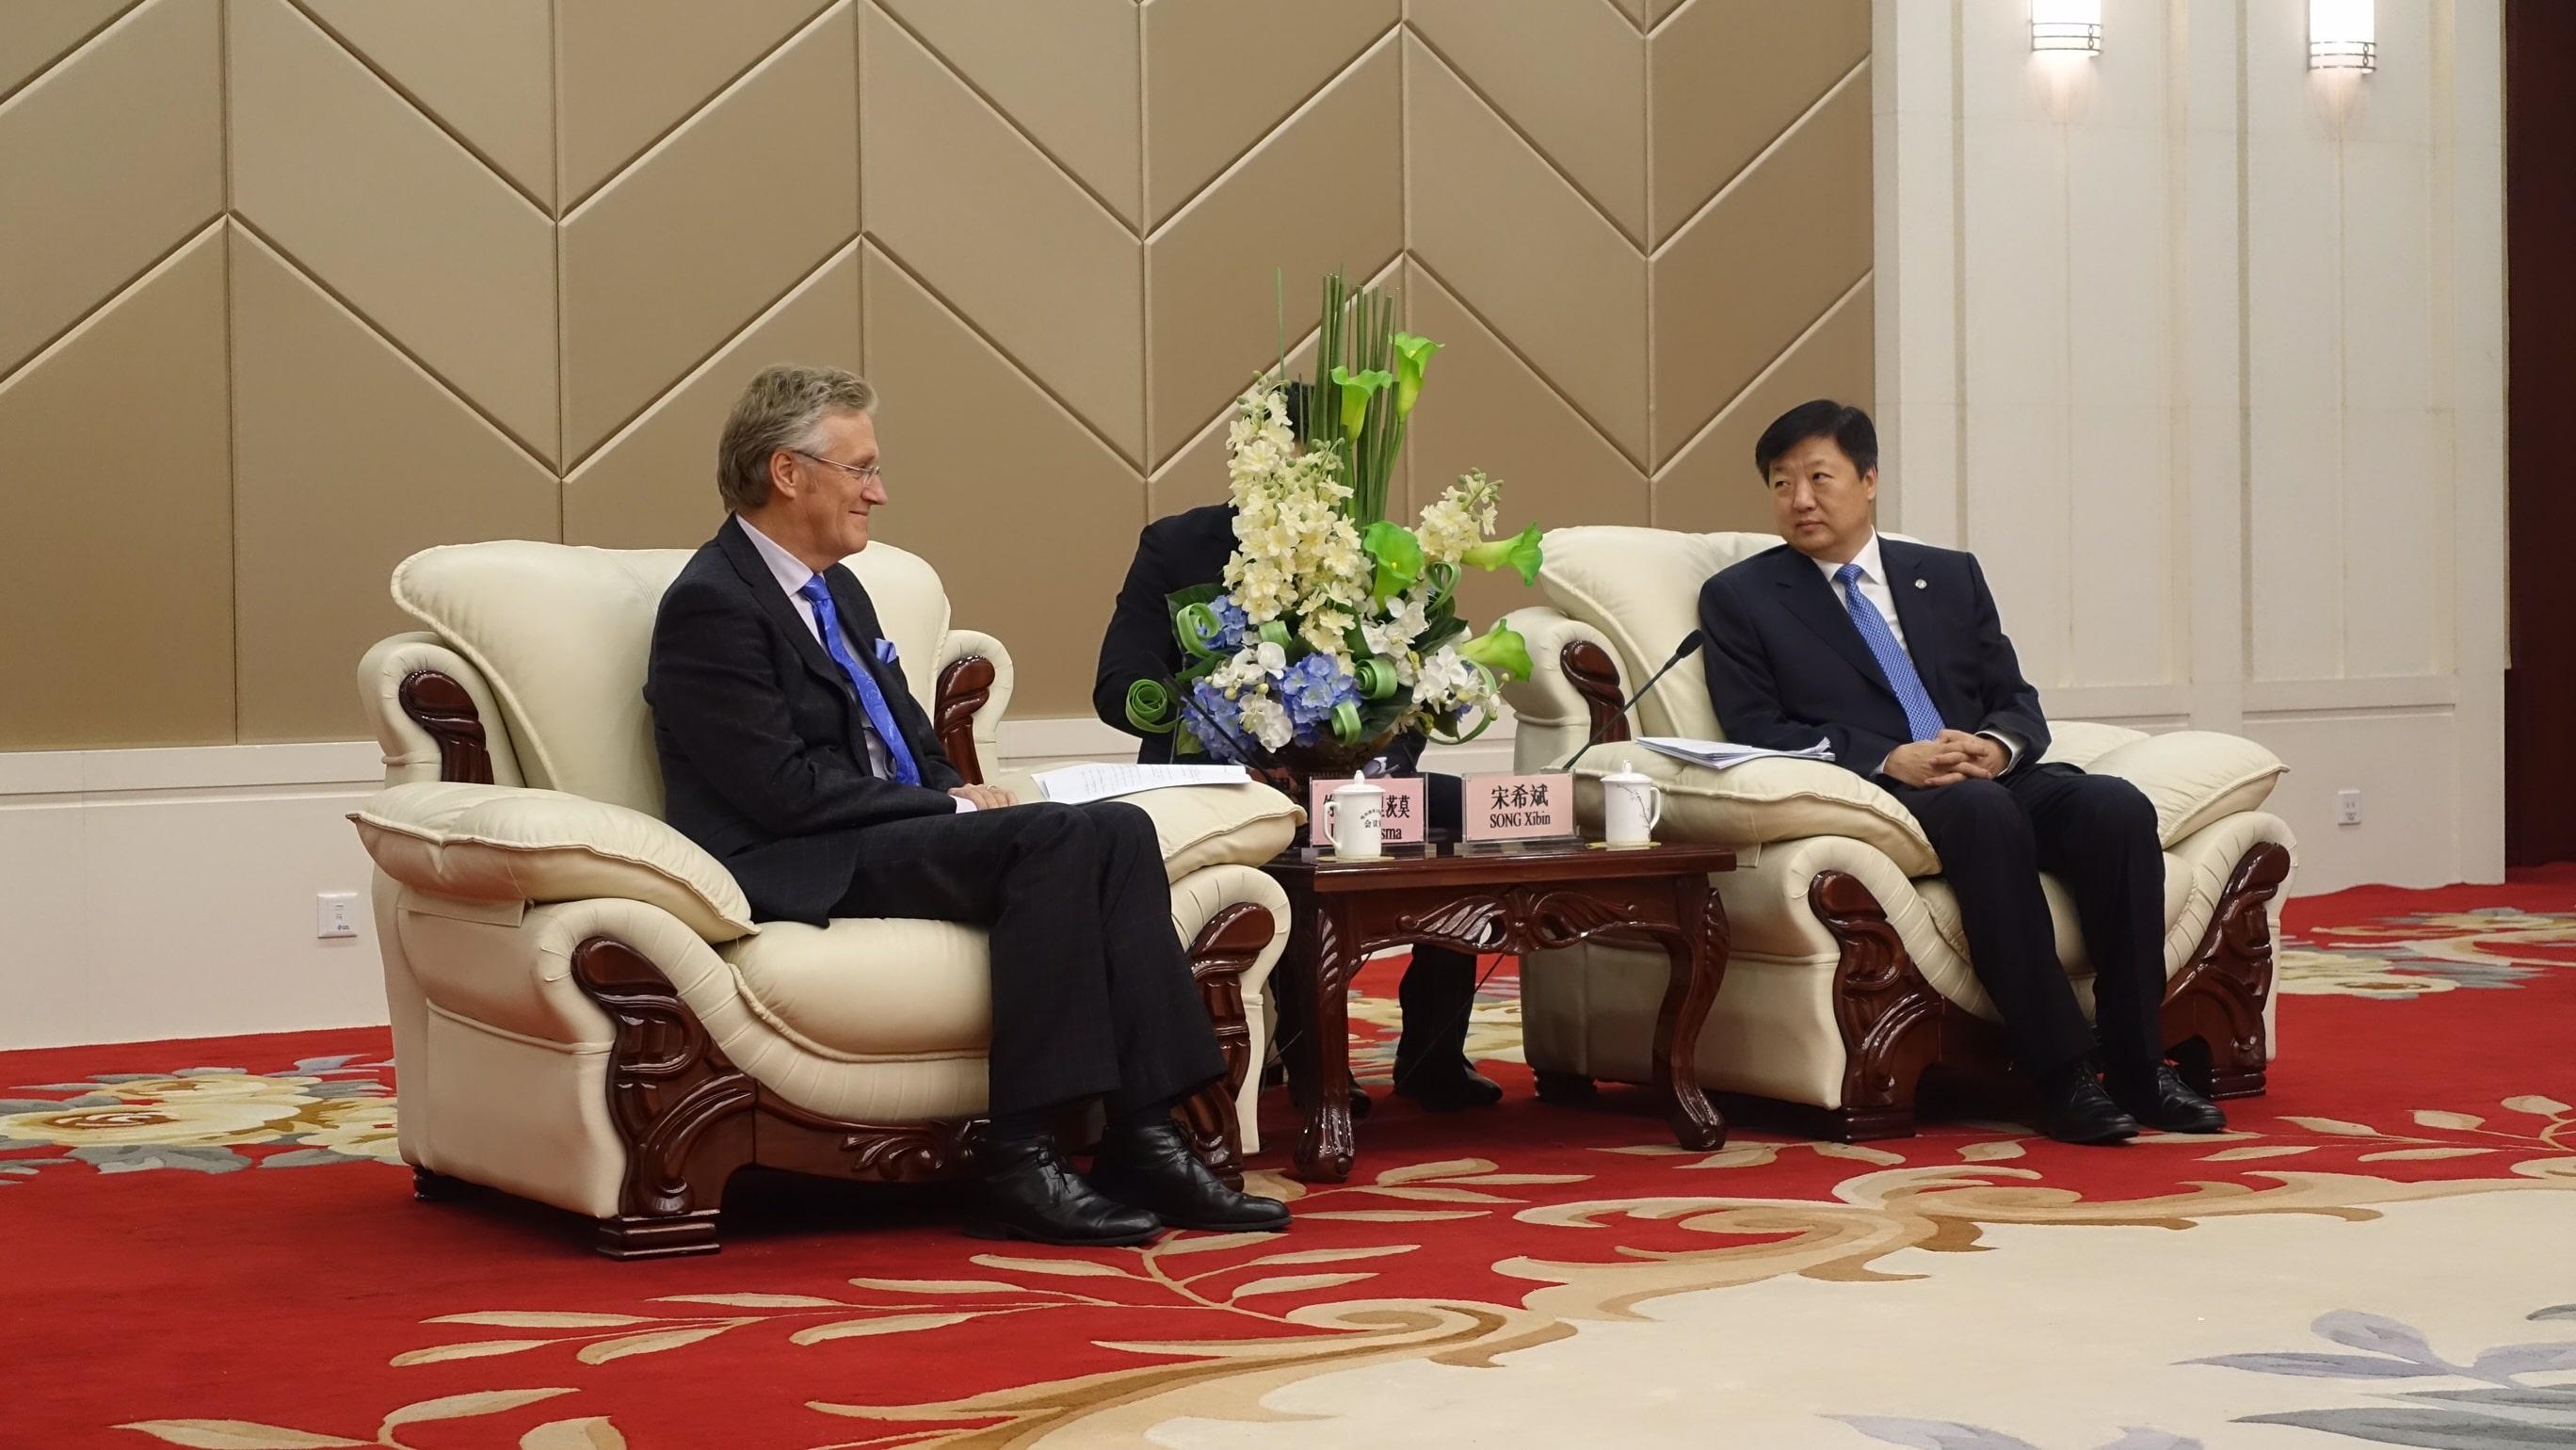 Haakman meeting with Harbin